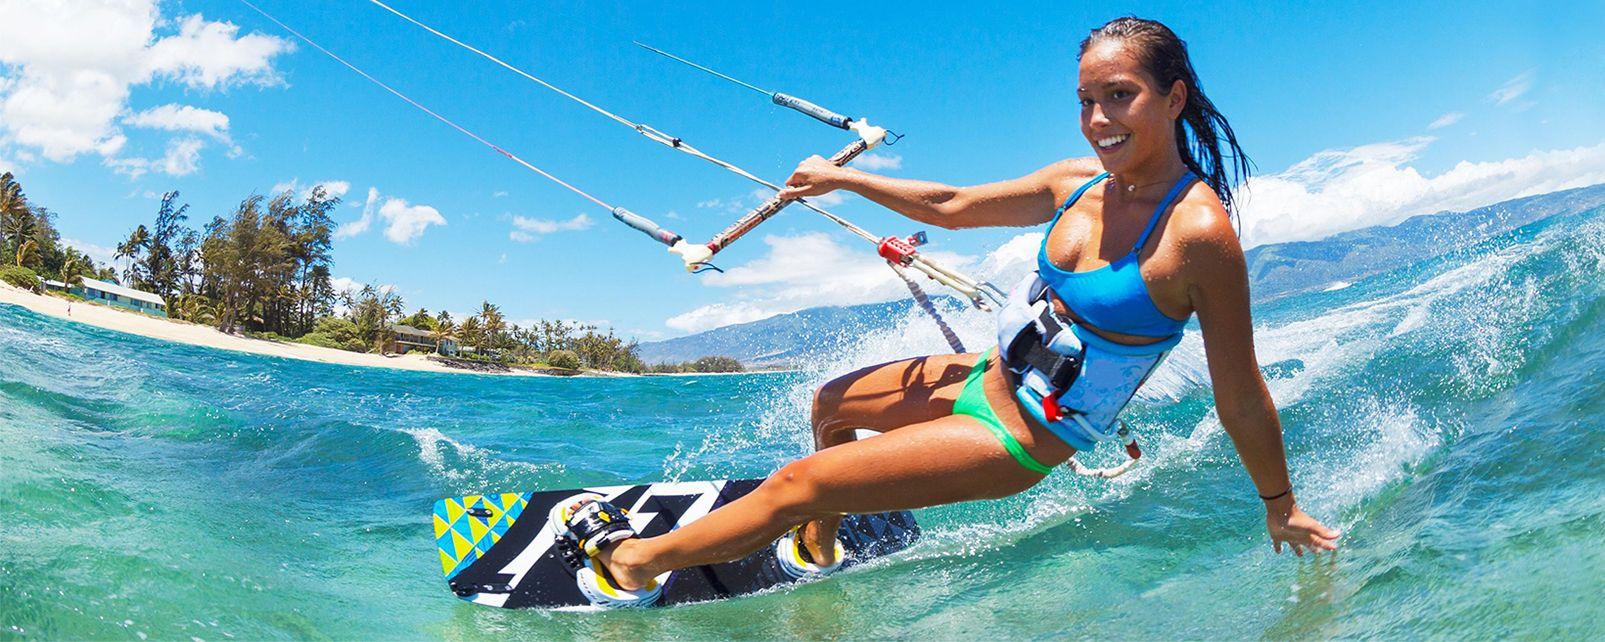 privado escolta Deportes acuáticos